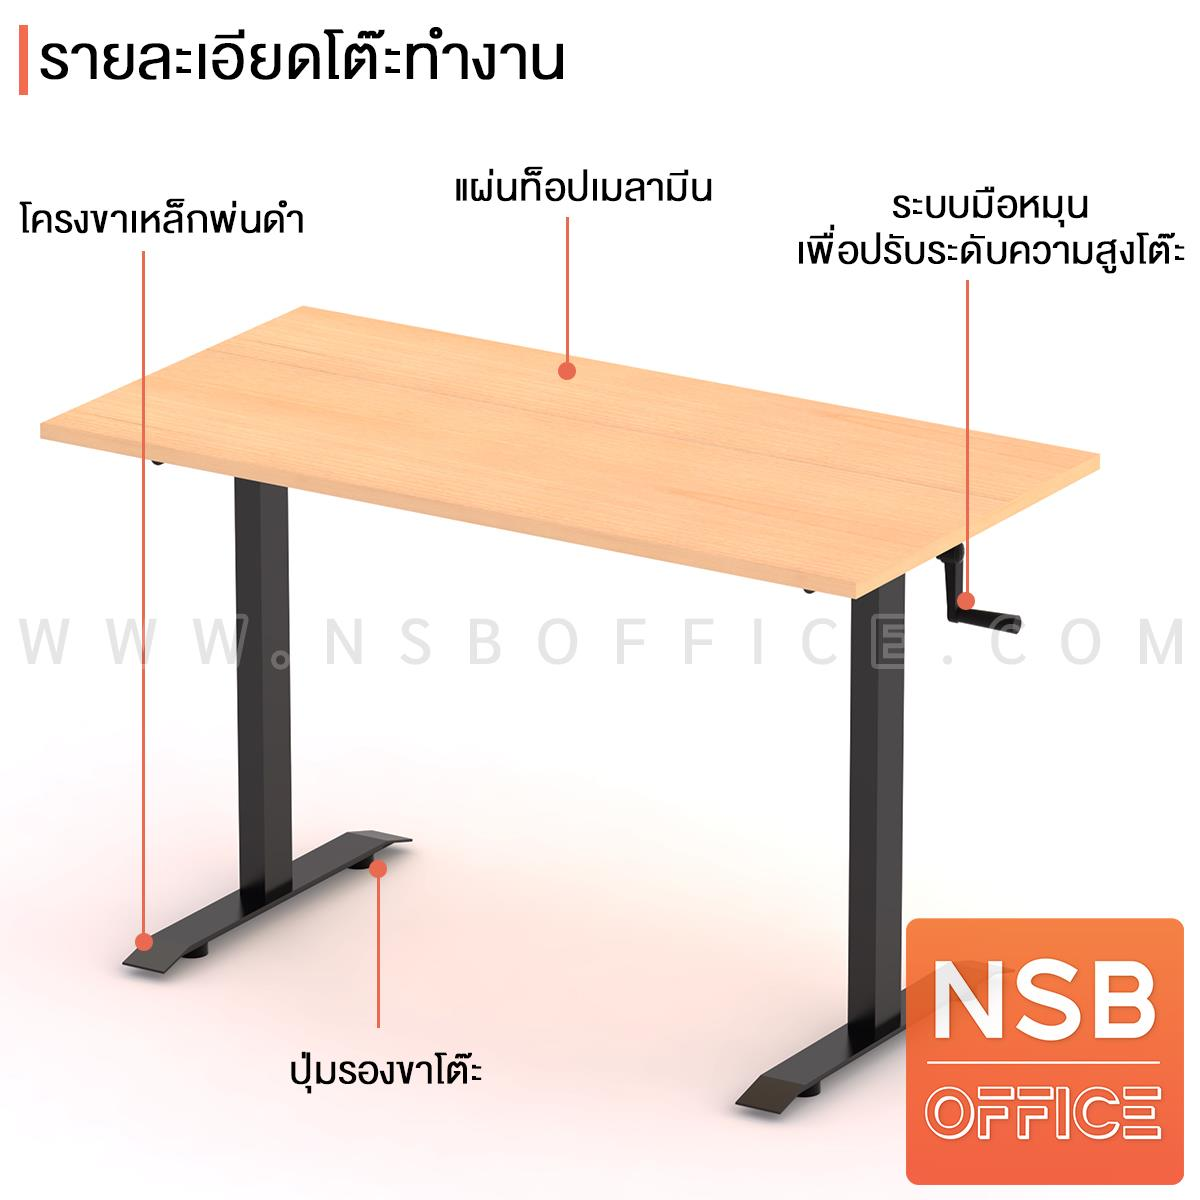 A10A083:โต๊ะทำงานปรับระดับ Sit 2 Stand  รุ่น XD-01 ขนาด 150W, 160W และ 180W cm. ระบบมือหมุน